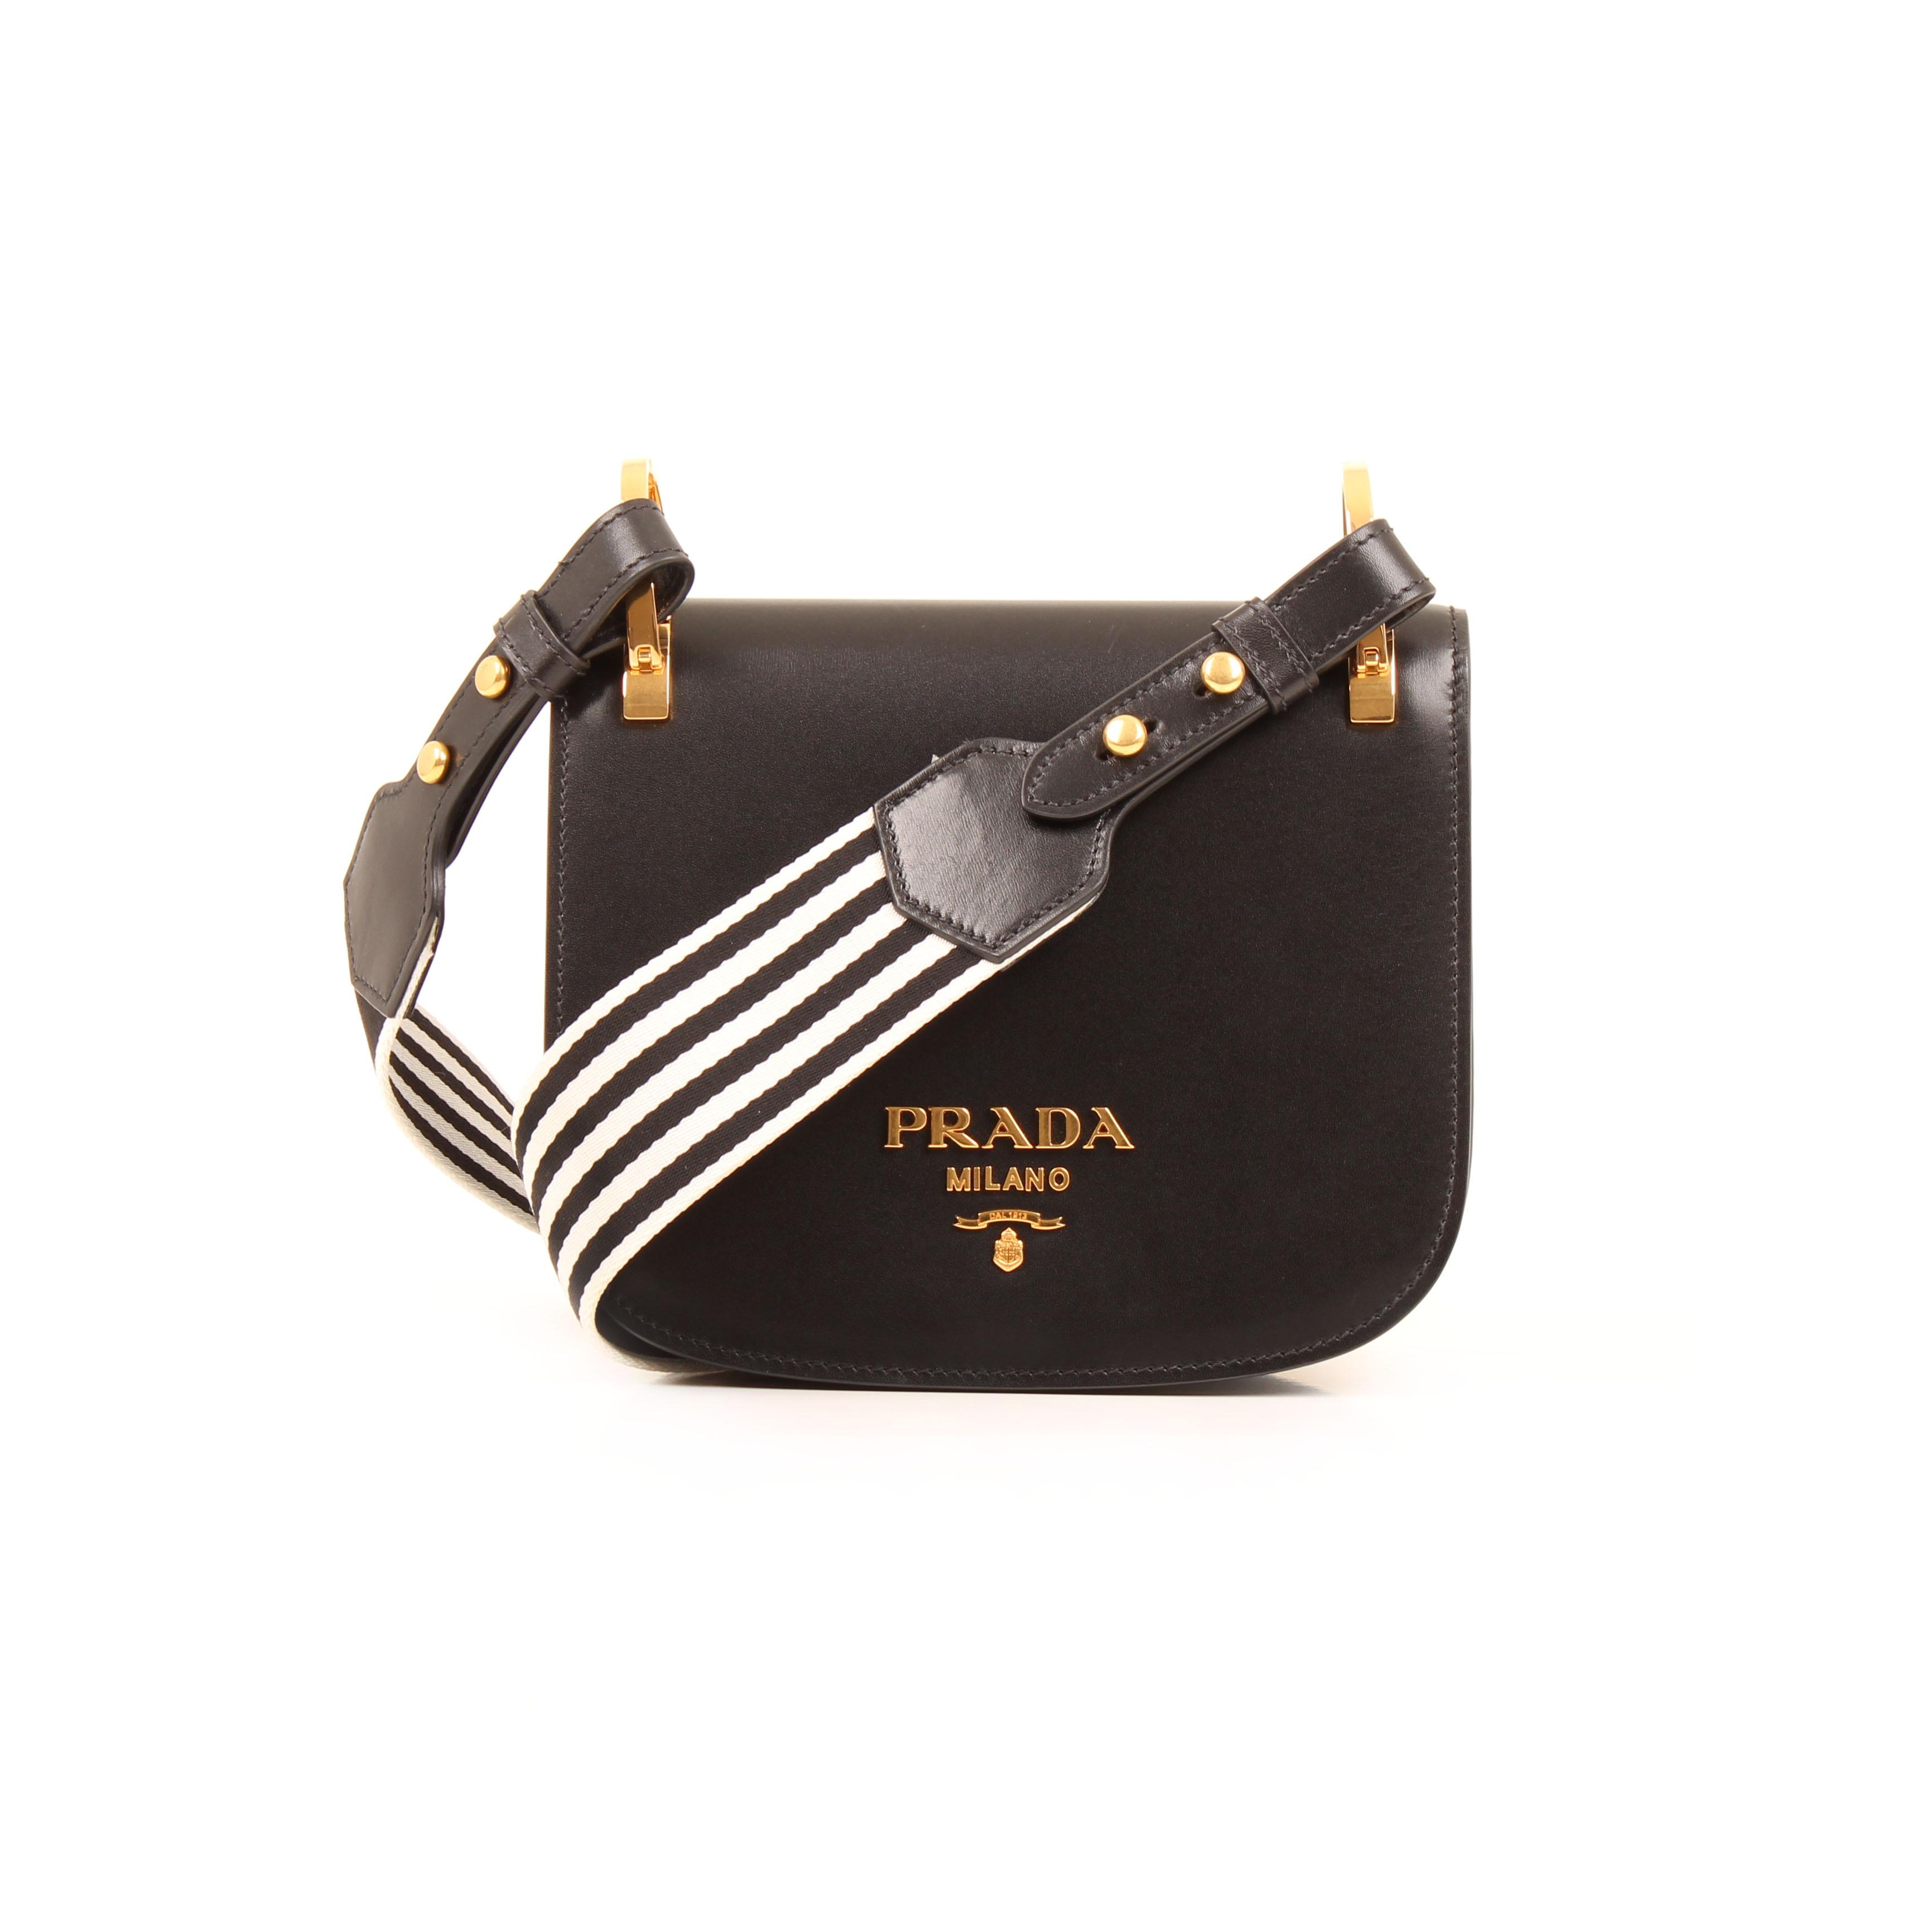 prada shoulder bag pionniere vitello leather black front with strap